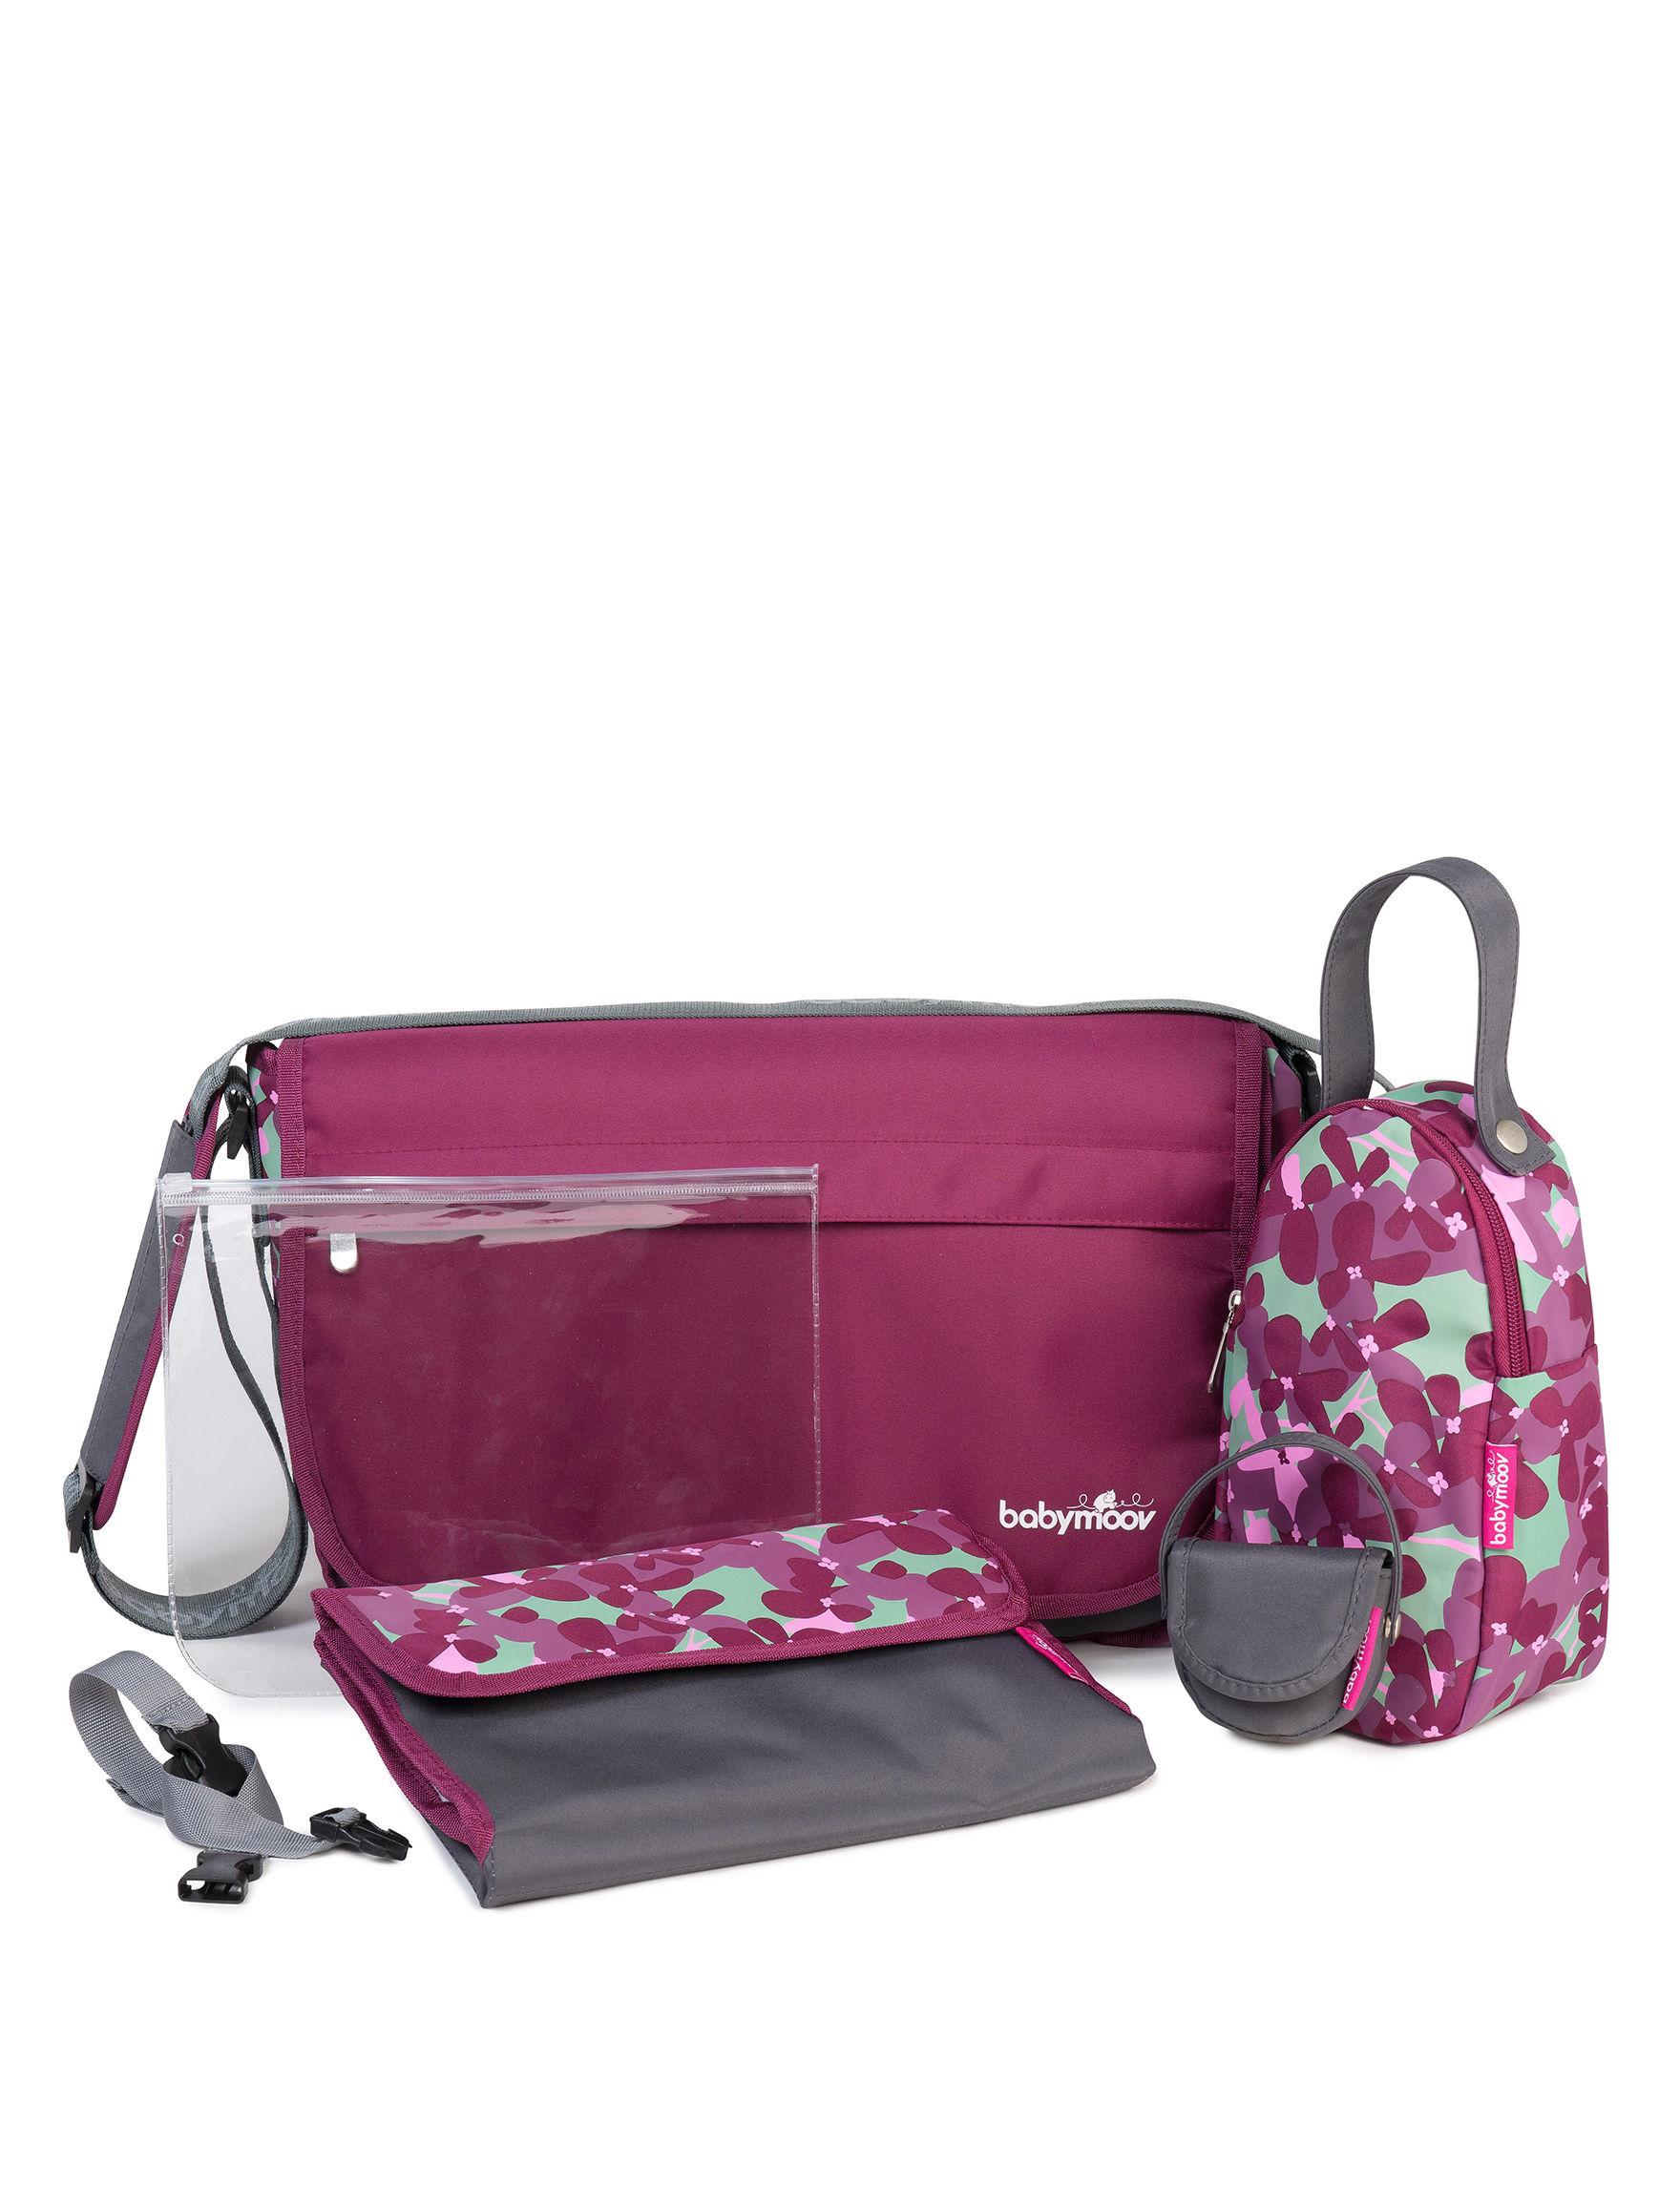 Babymoov Hibiscus Diaper Bags